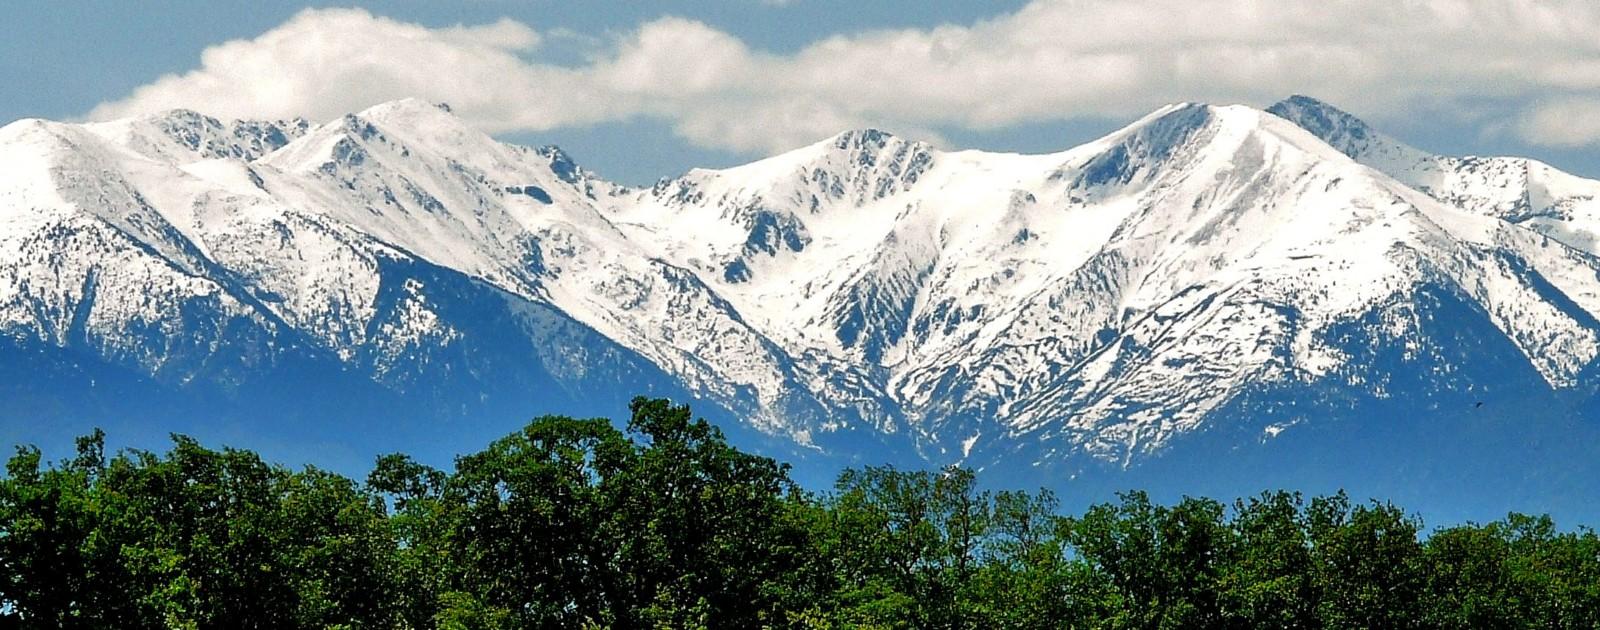 les pyrenees - Image